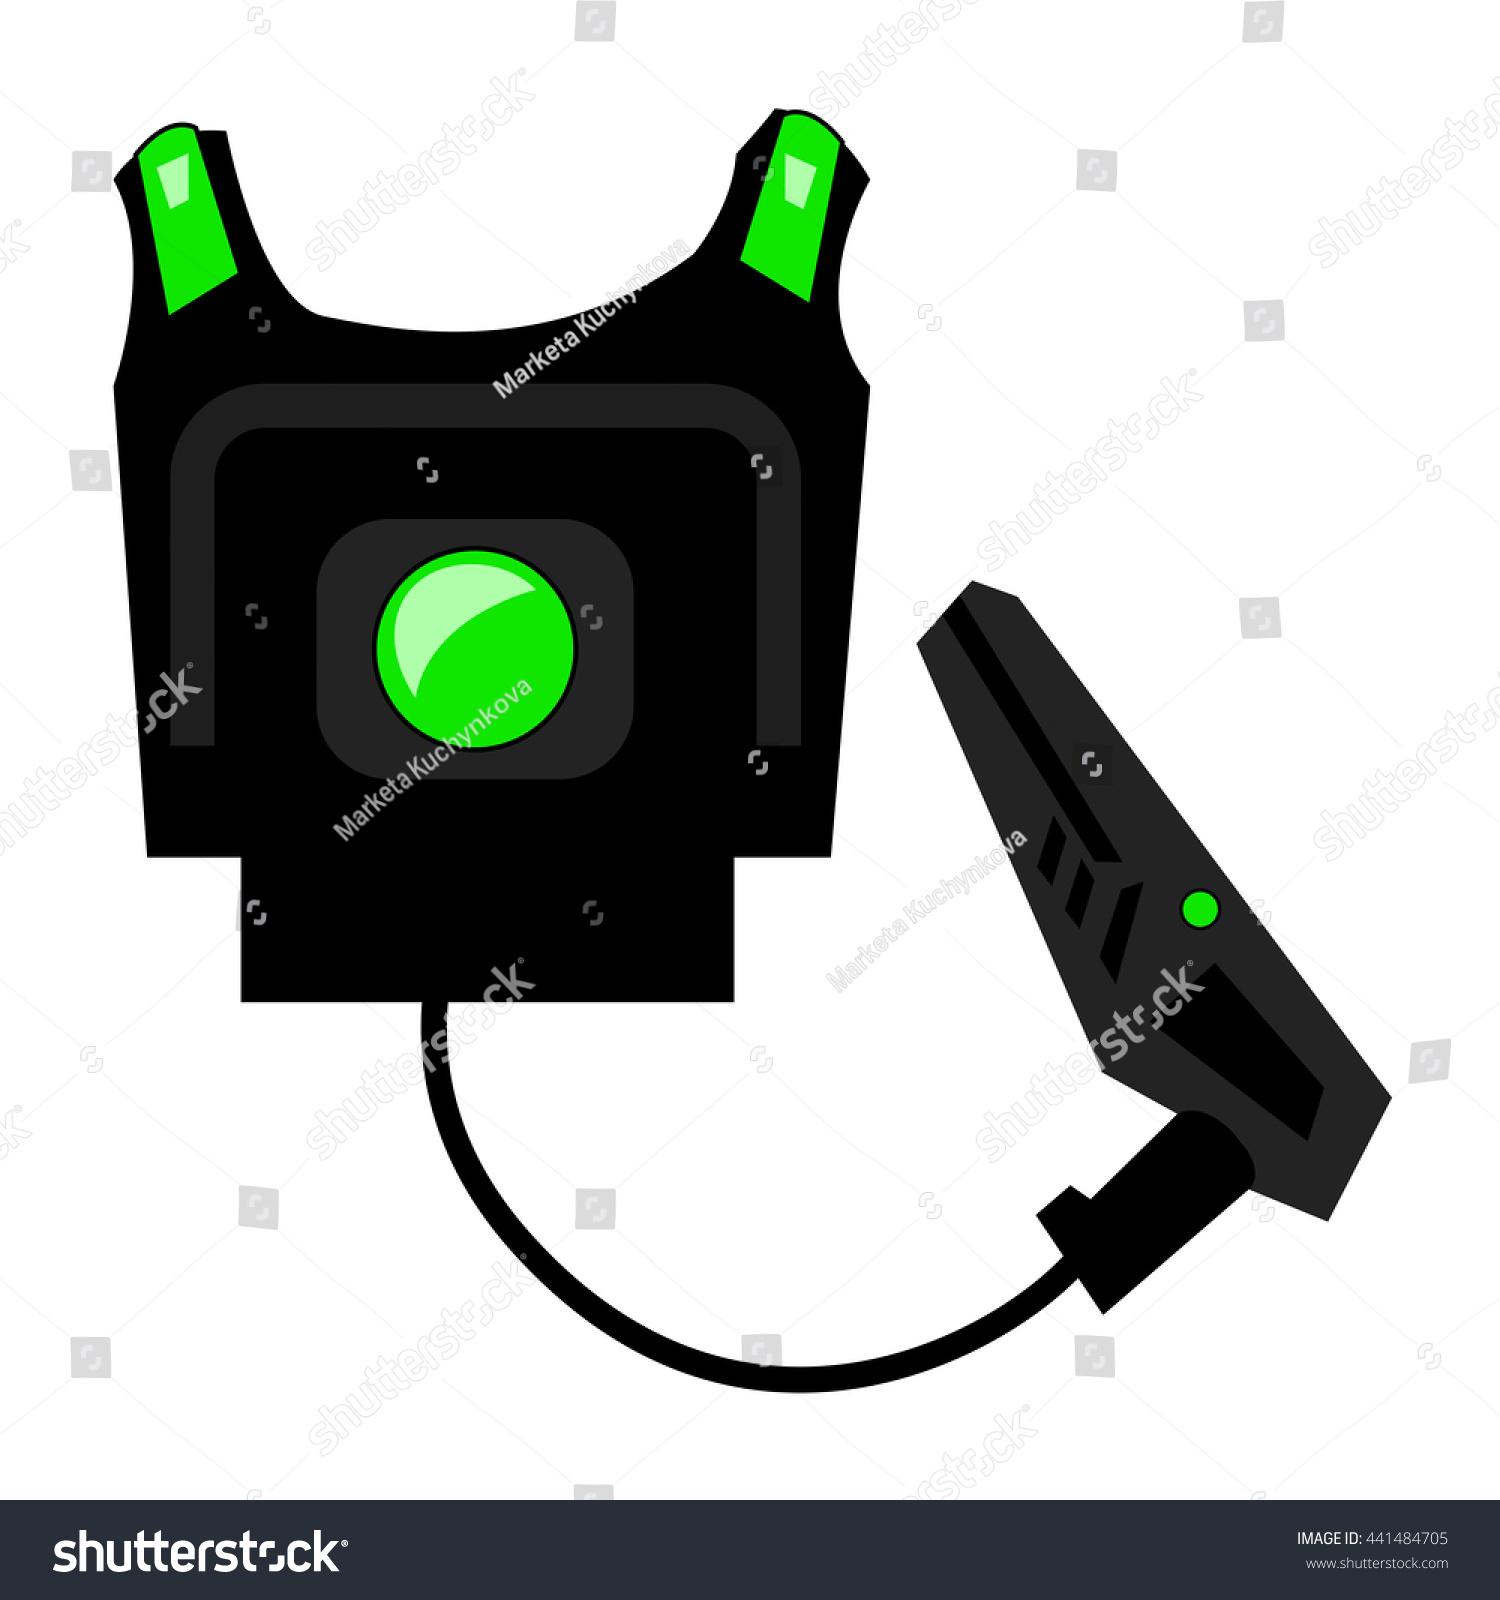 laser game laser tag equipment gun stock vector hd royalty free rh shutterstock com Laser Quest Go Cart Clip Art